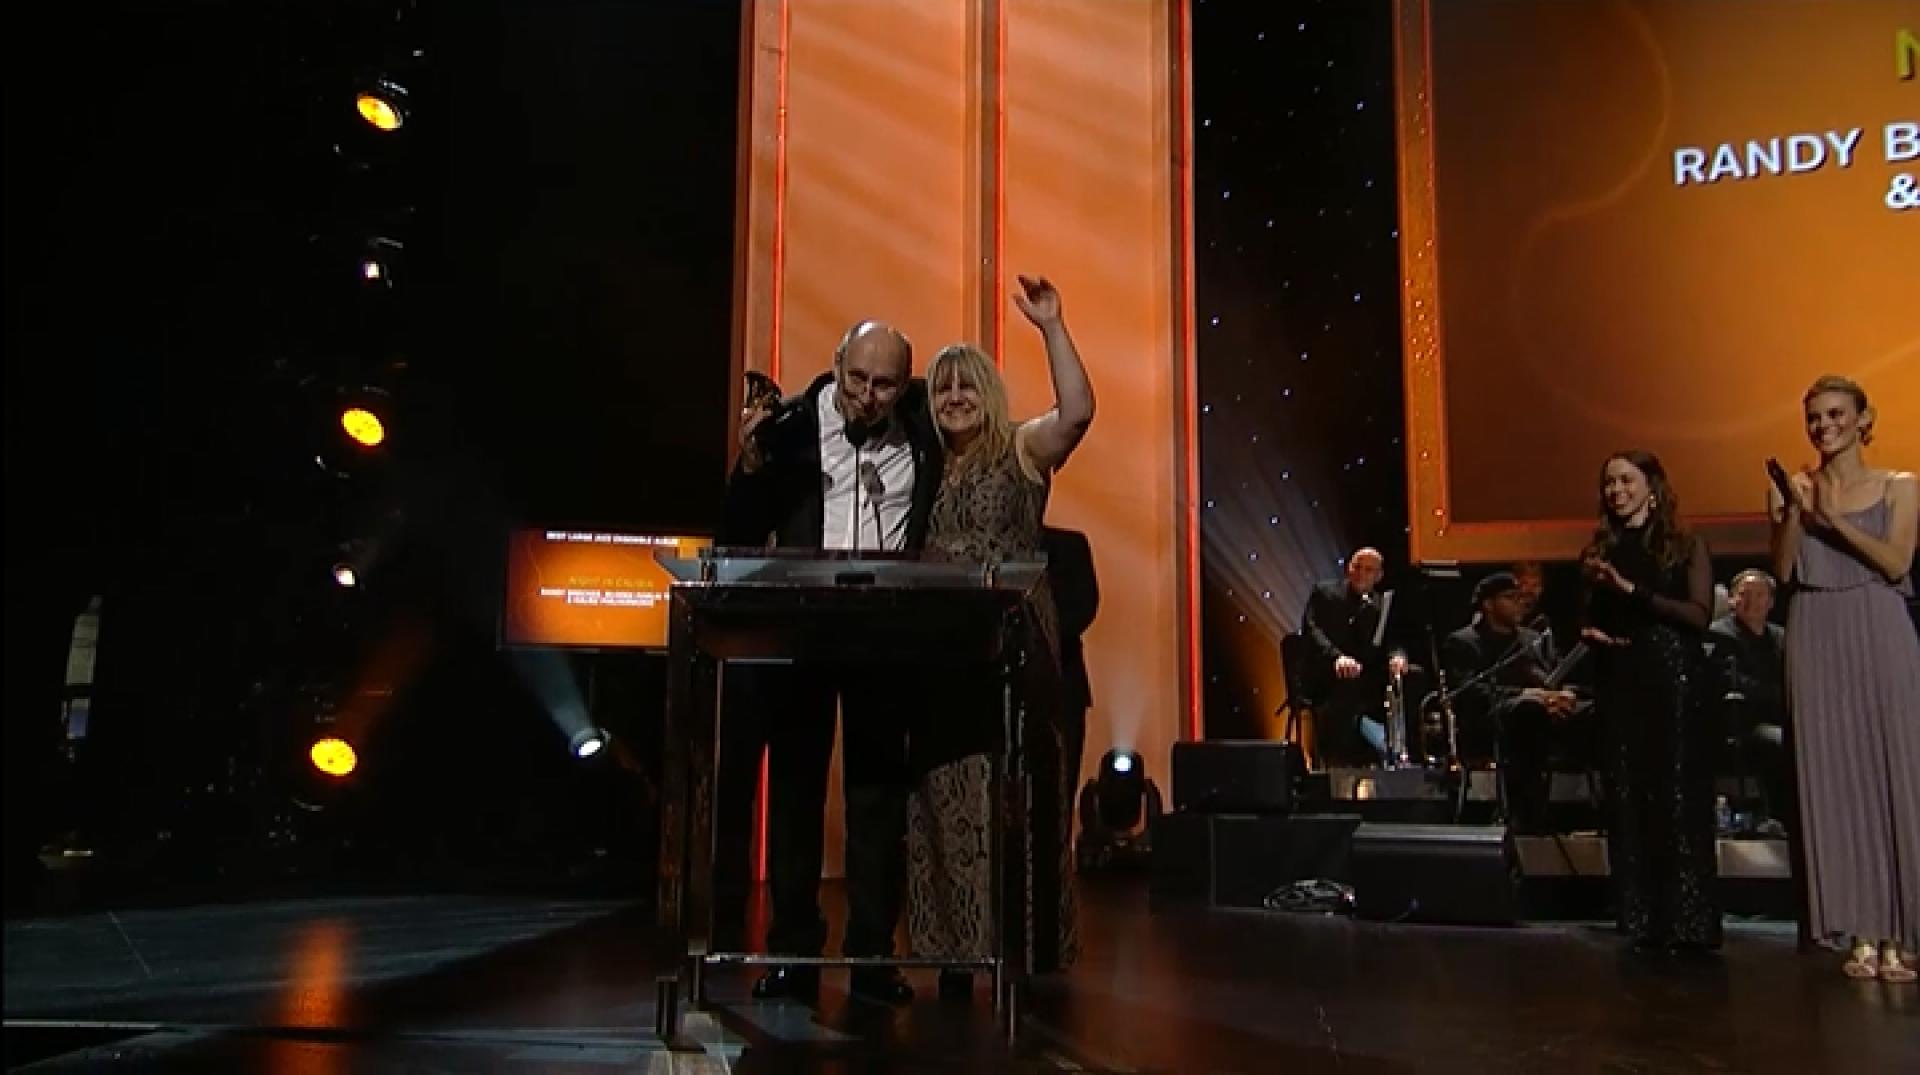 Grammy Awards 2014, Los Angeles